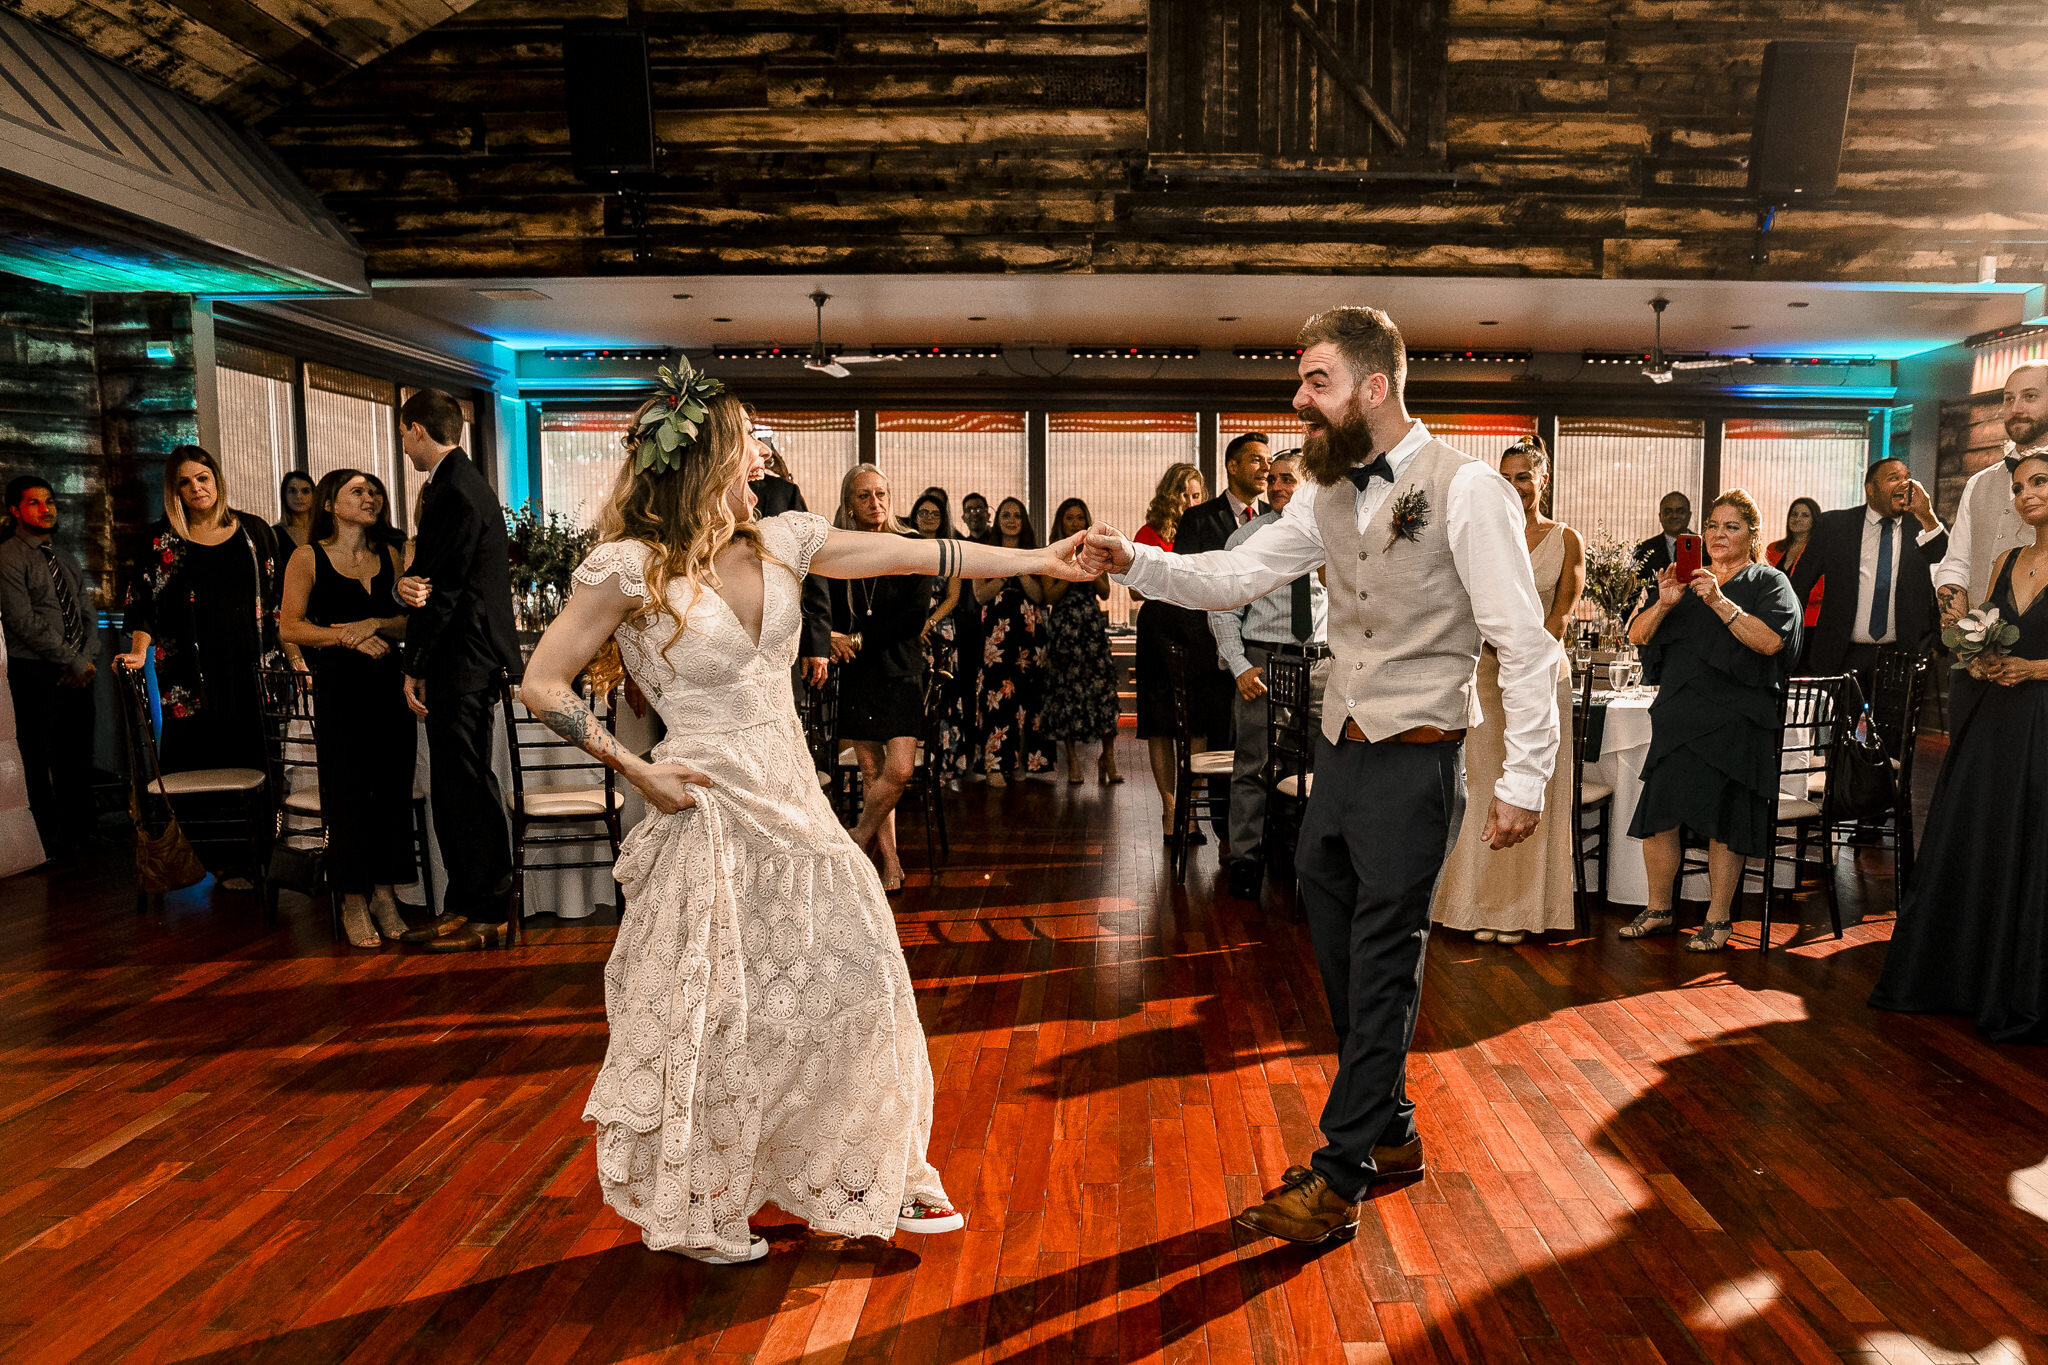 Hoffman-618-New-Jersey-Wedding-Photographer-39.JPG